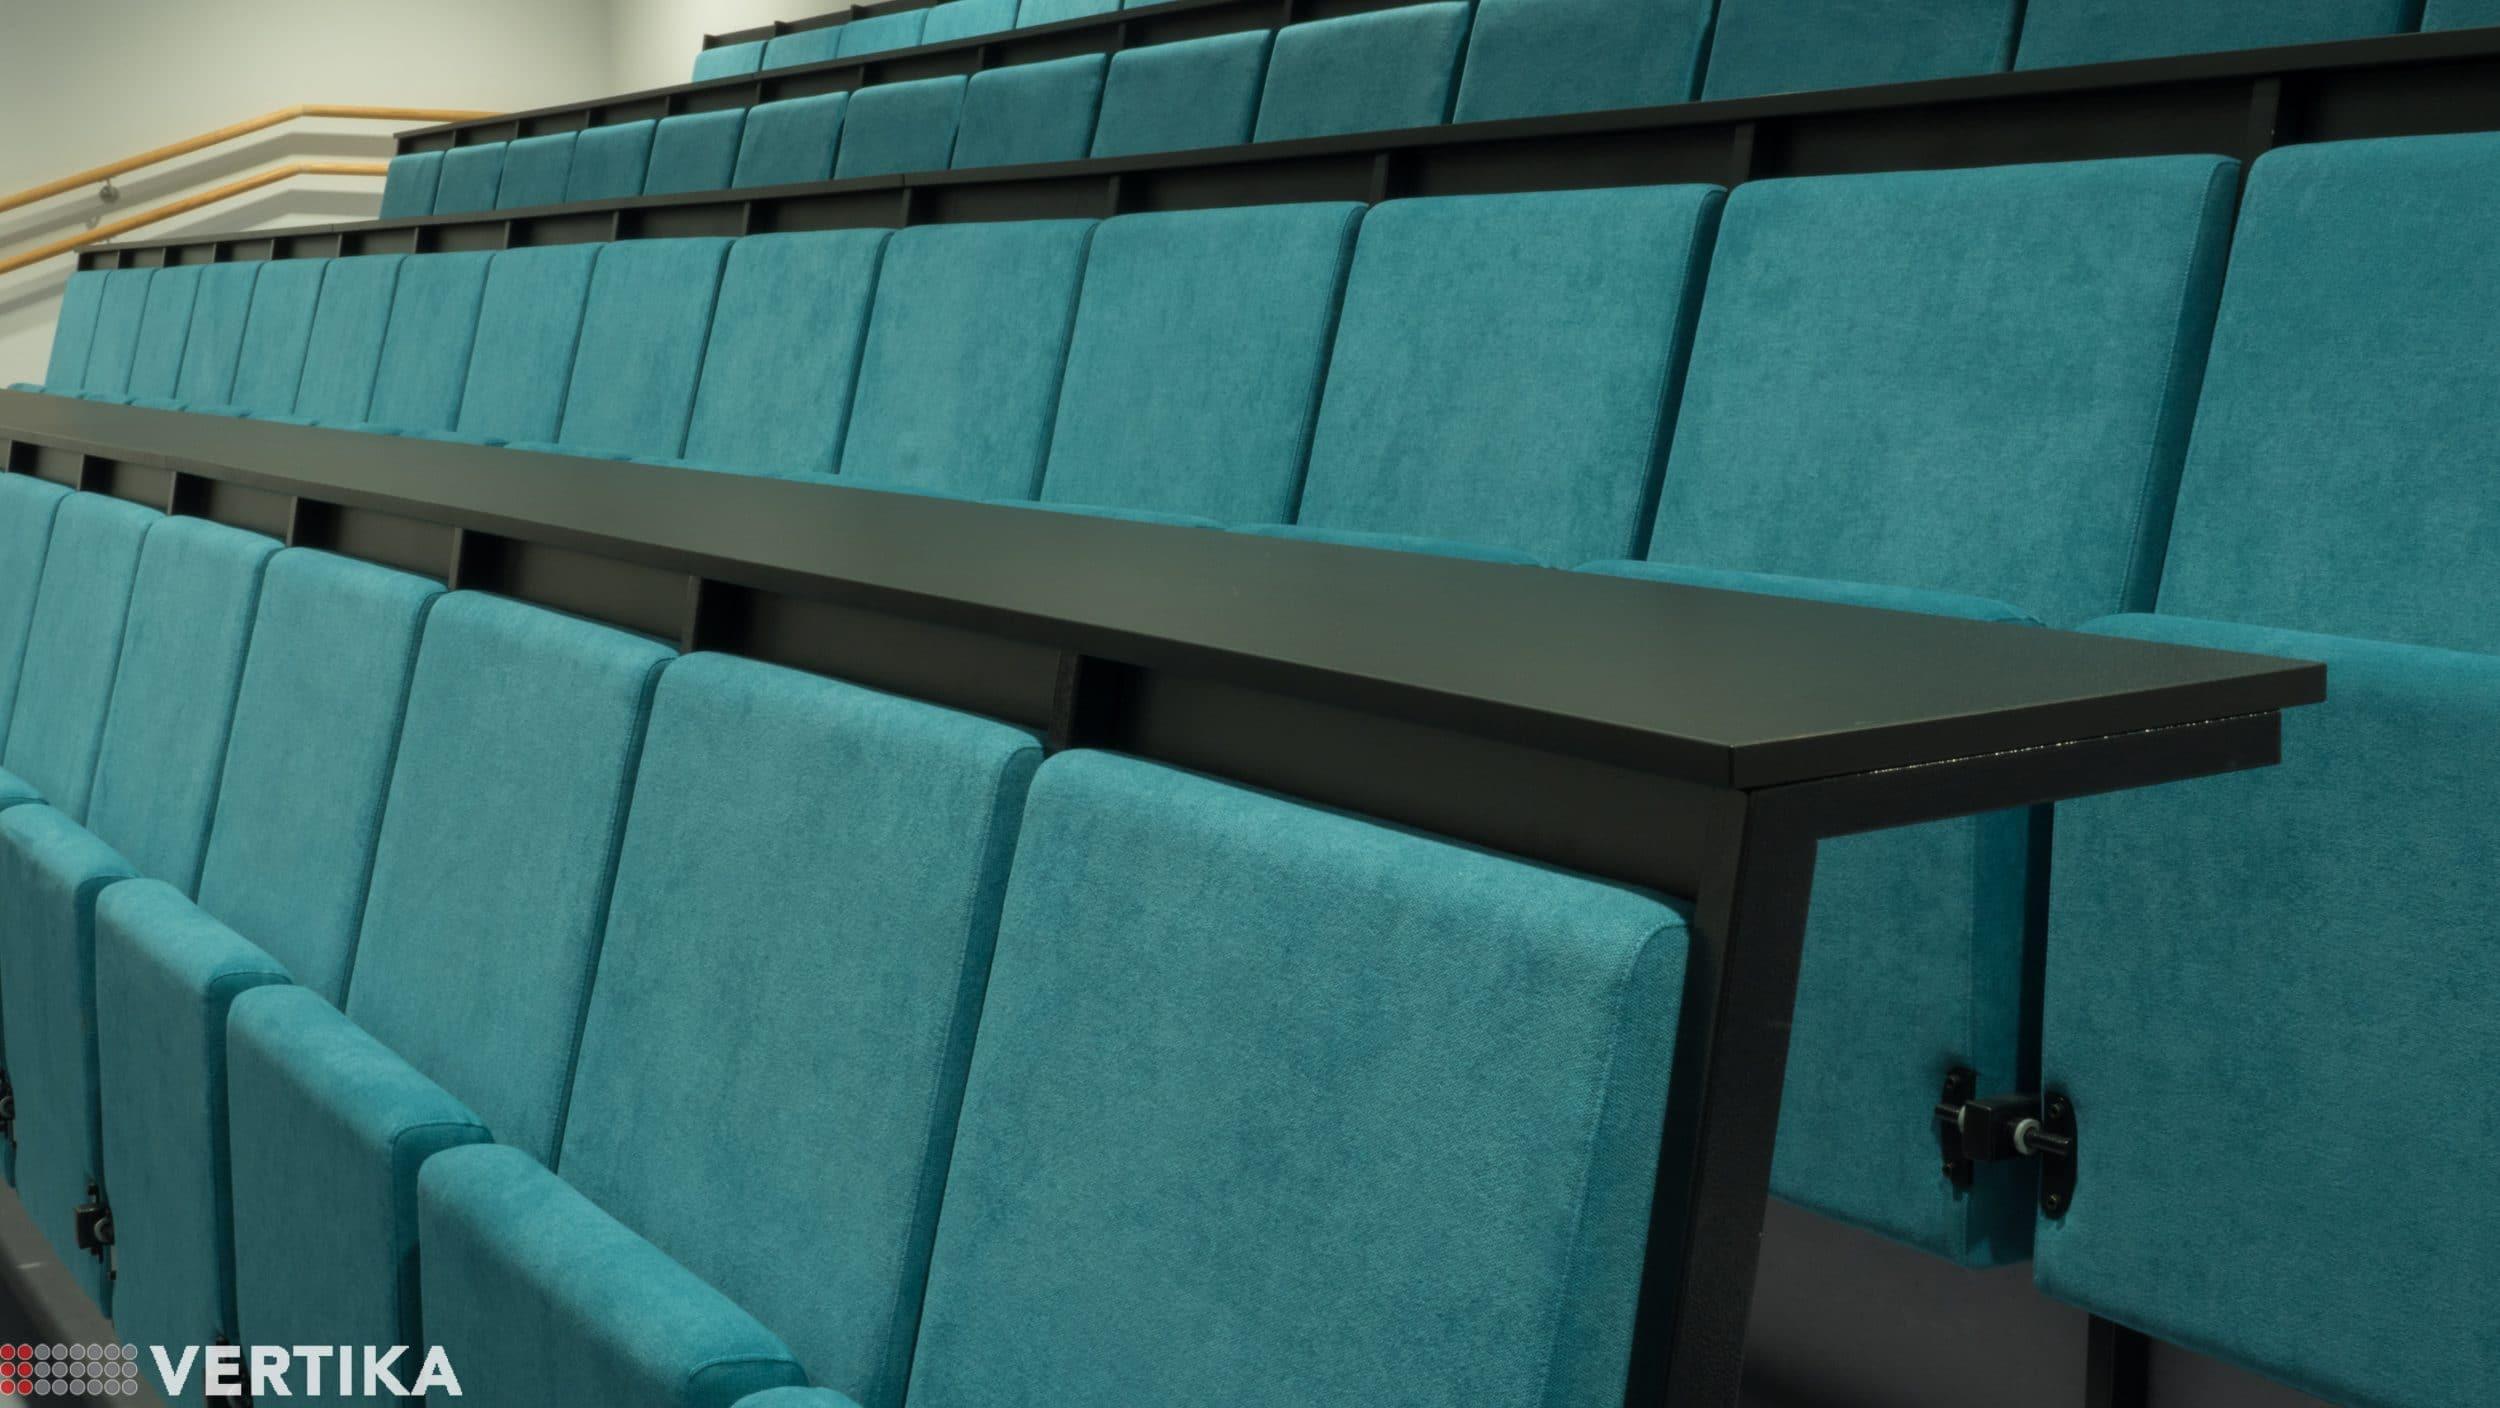 auditorium sitteplasser